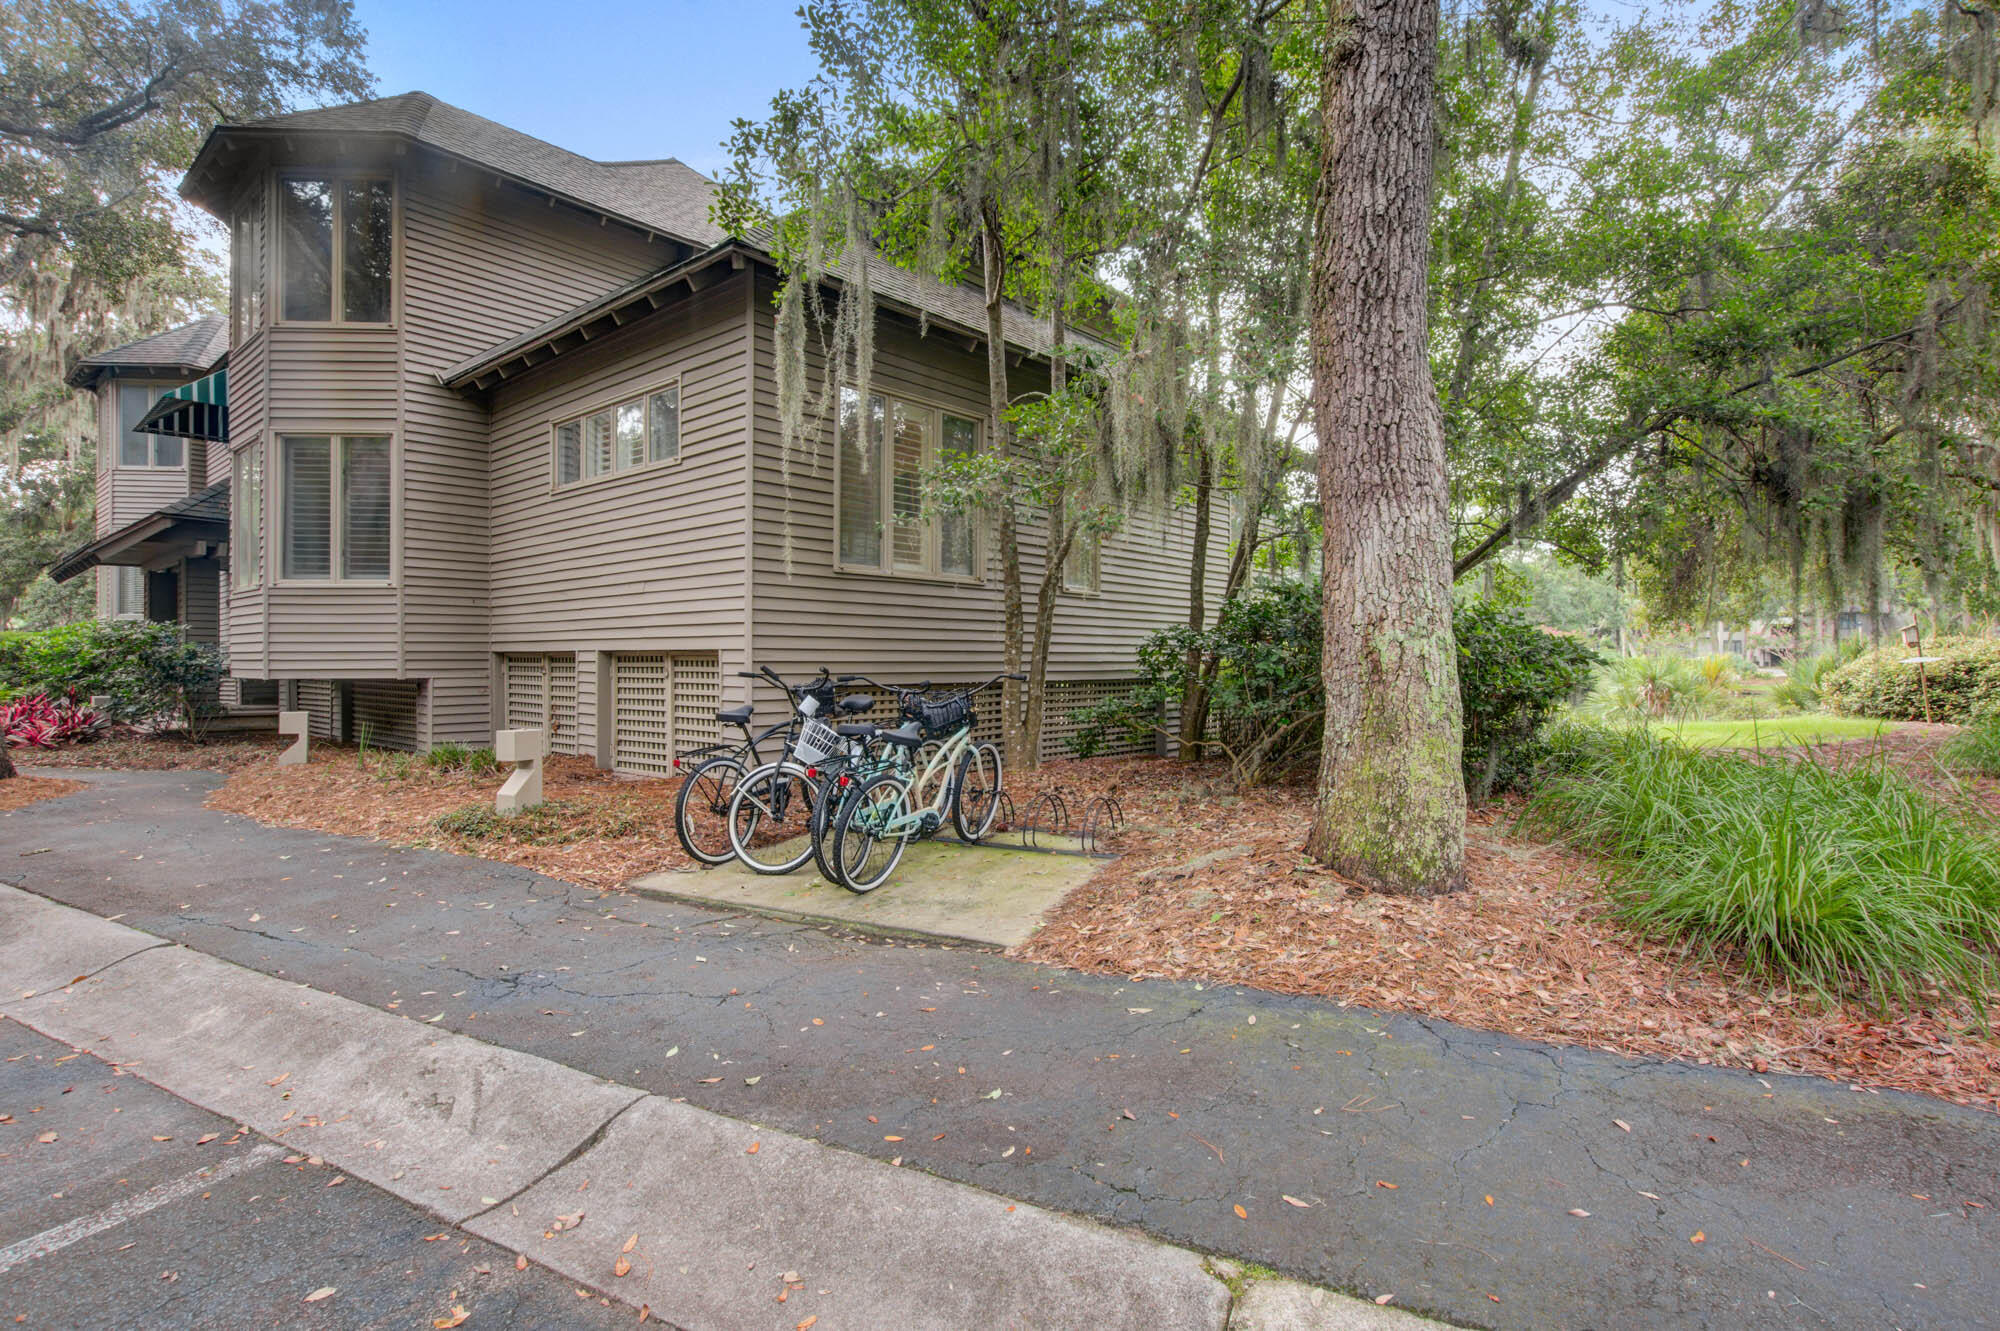 Kiawah Island Homes For Sale - 5513 Green Dolphin Way, Kiawah Island, SC - 22